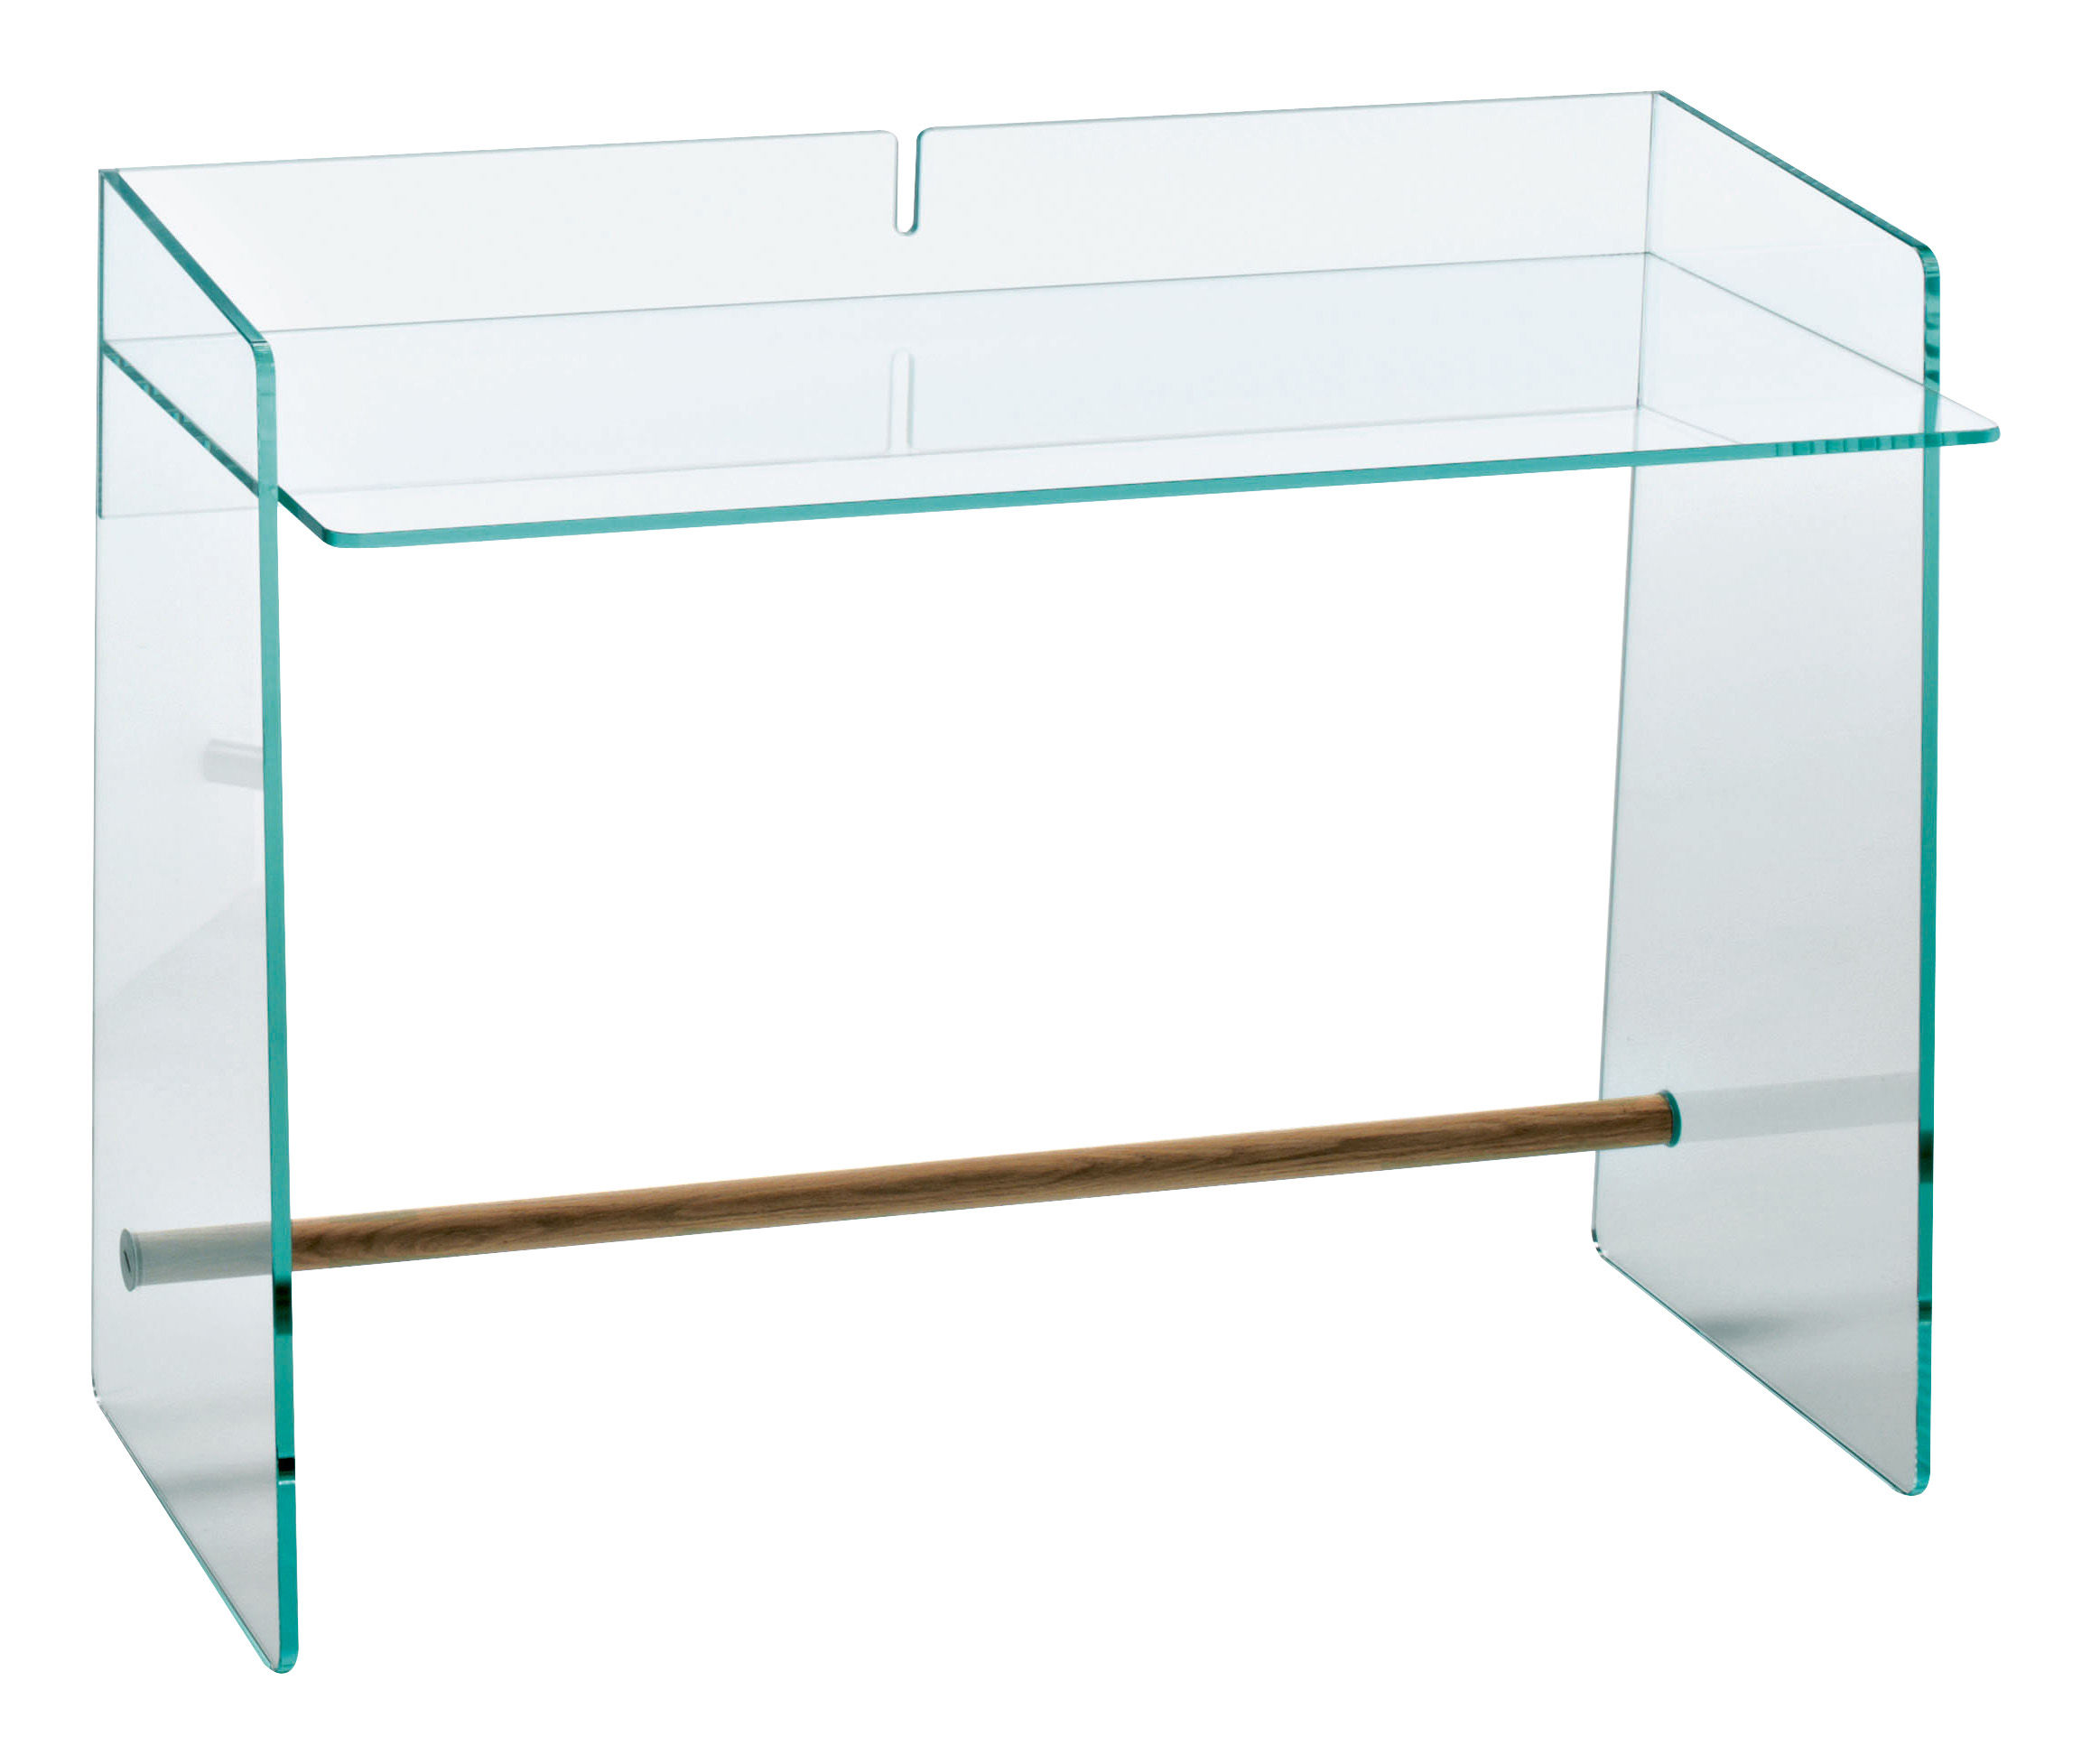 Mobilier - Bureaux - Bureau Pirandello / 110 x 49 cm - Glas Italia - Transparent / Repose-pieds frêne naturel - Frêne naturel, Inox, Verre